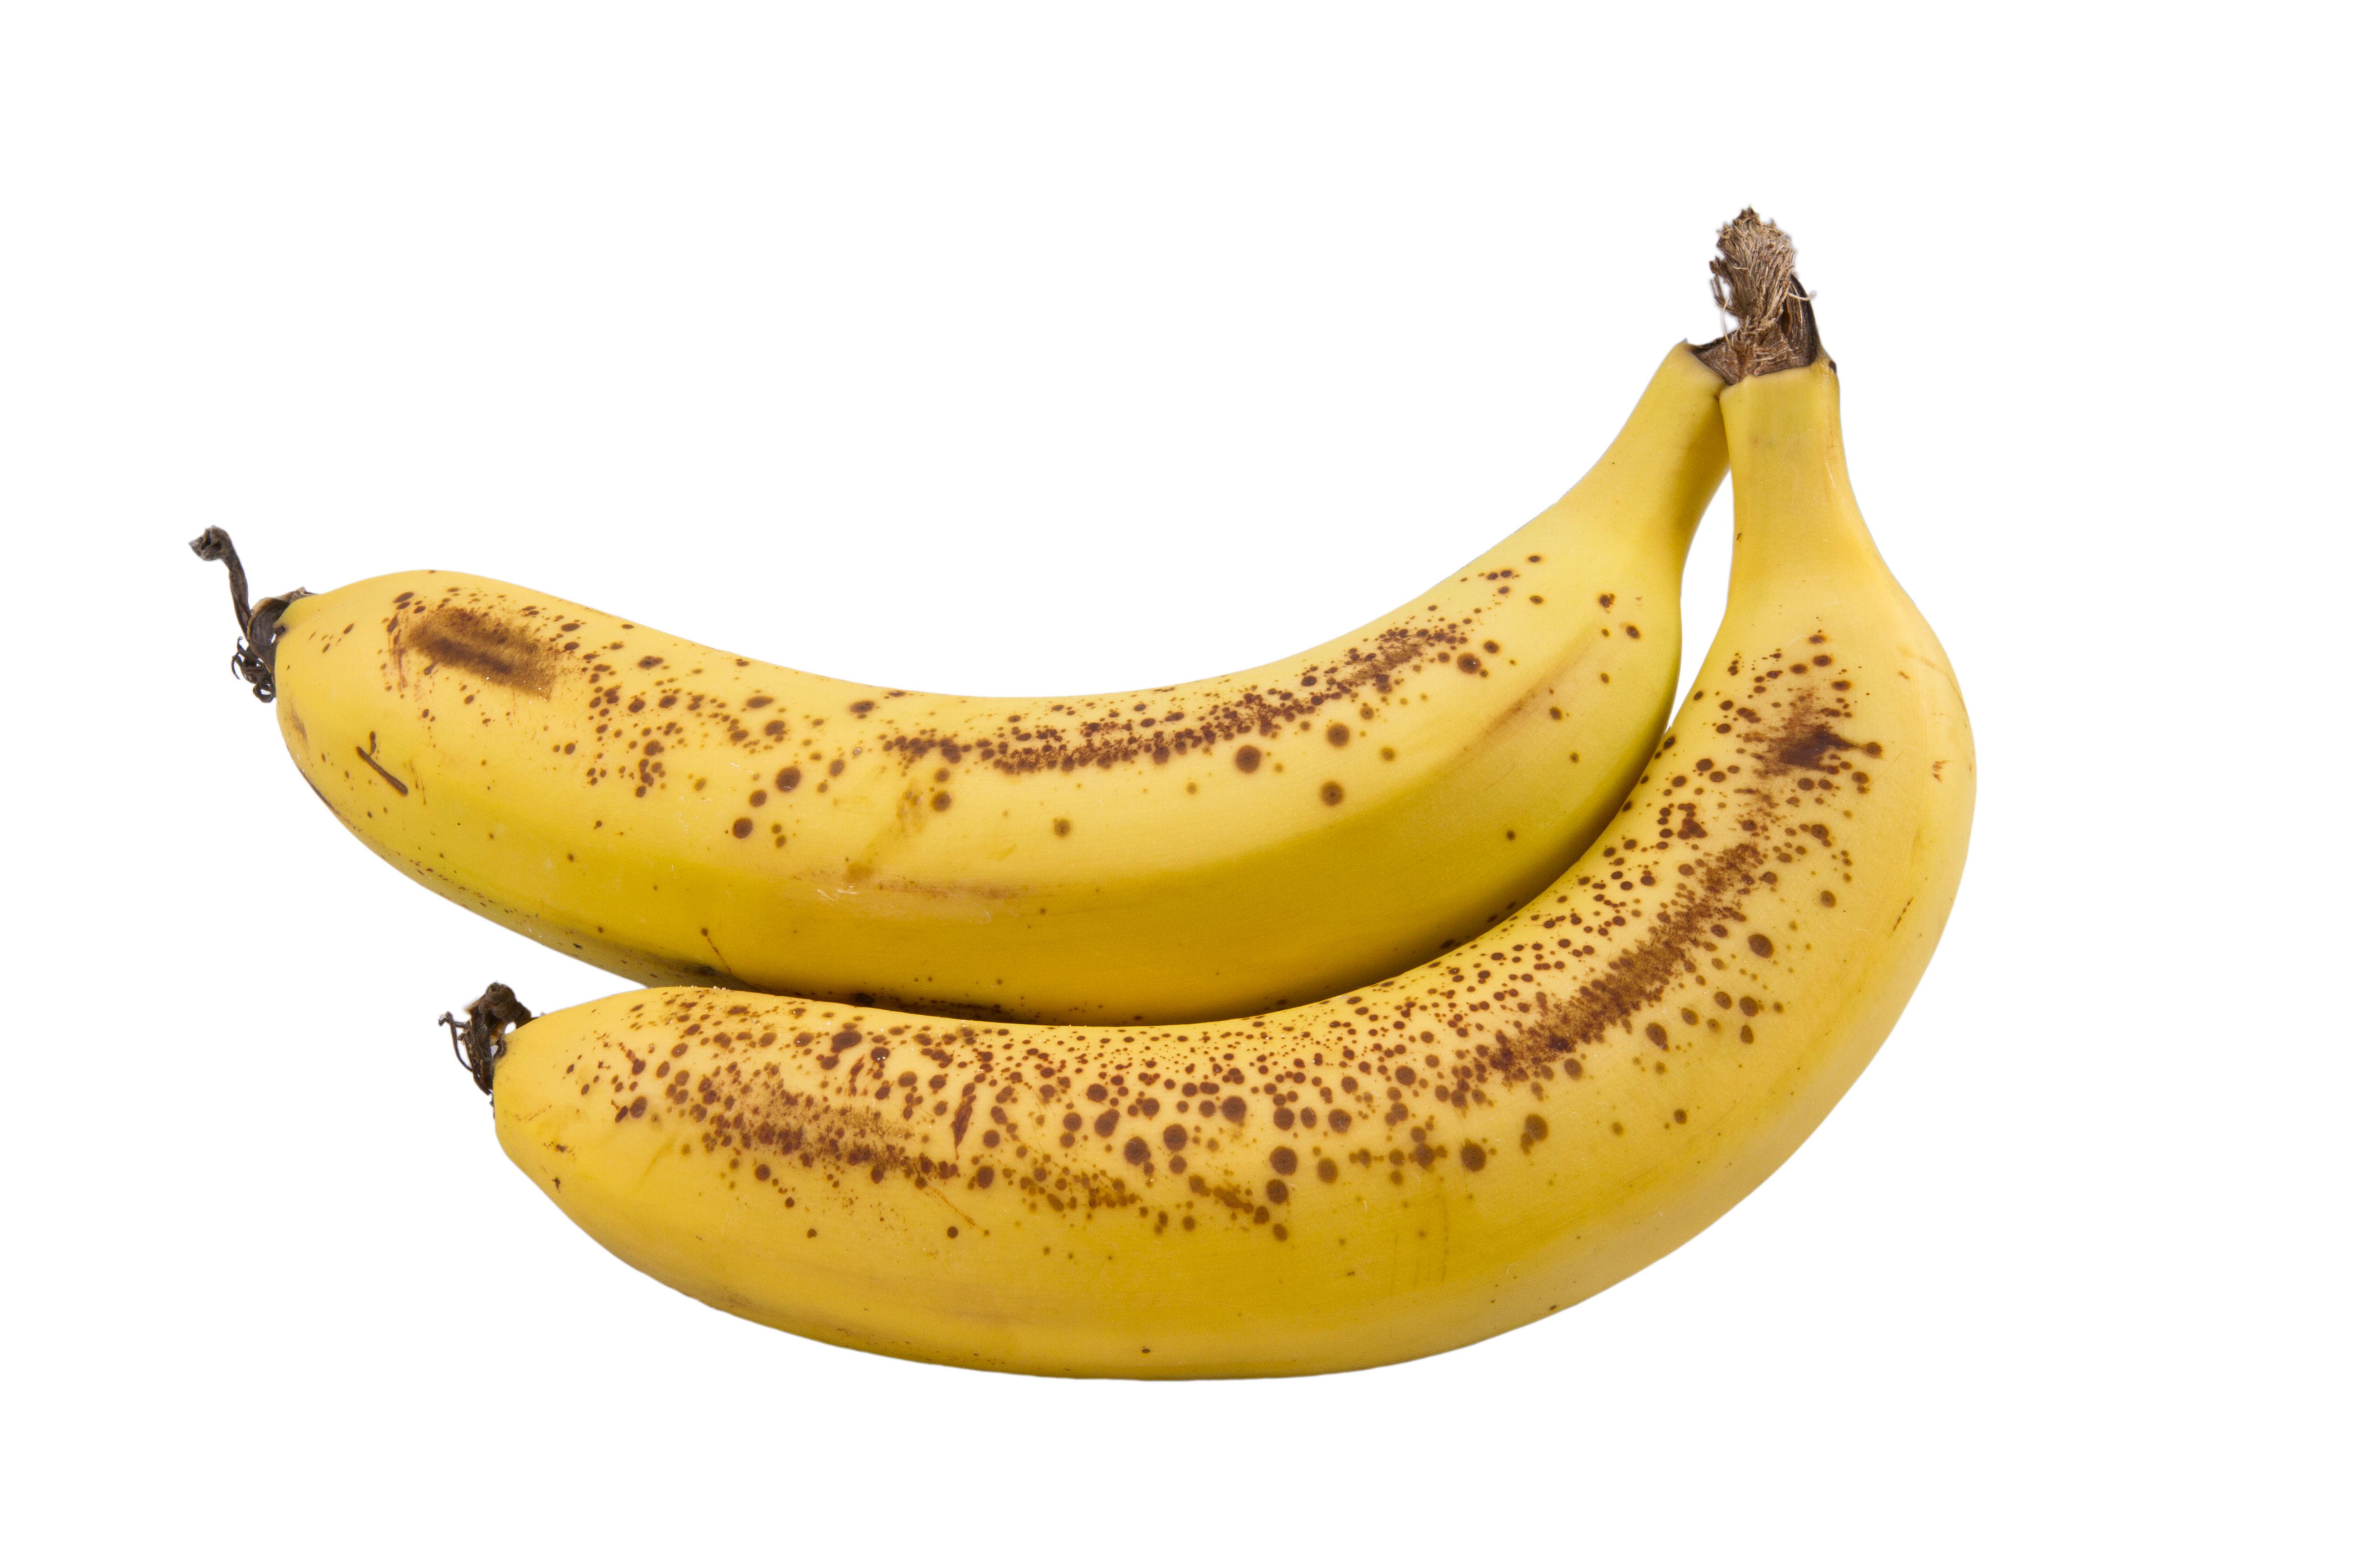 Die leckere Bananen-Haarkur zum selbst zaubern. © shutterstock.com